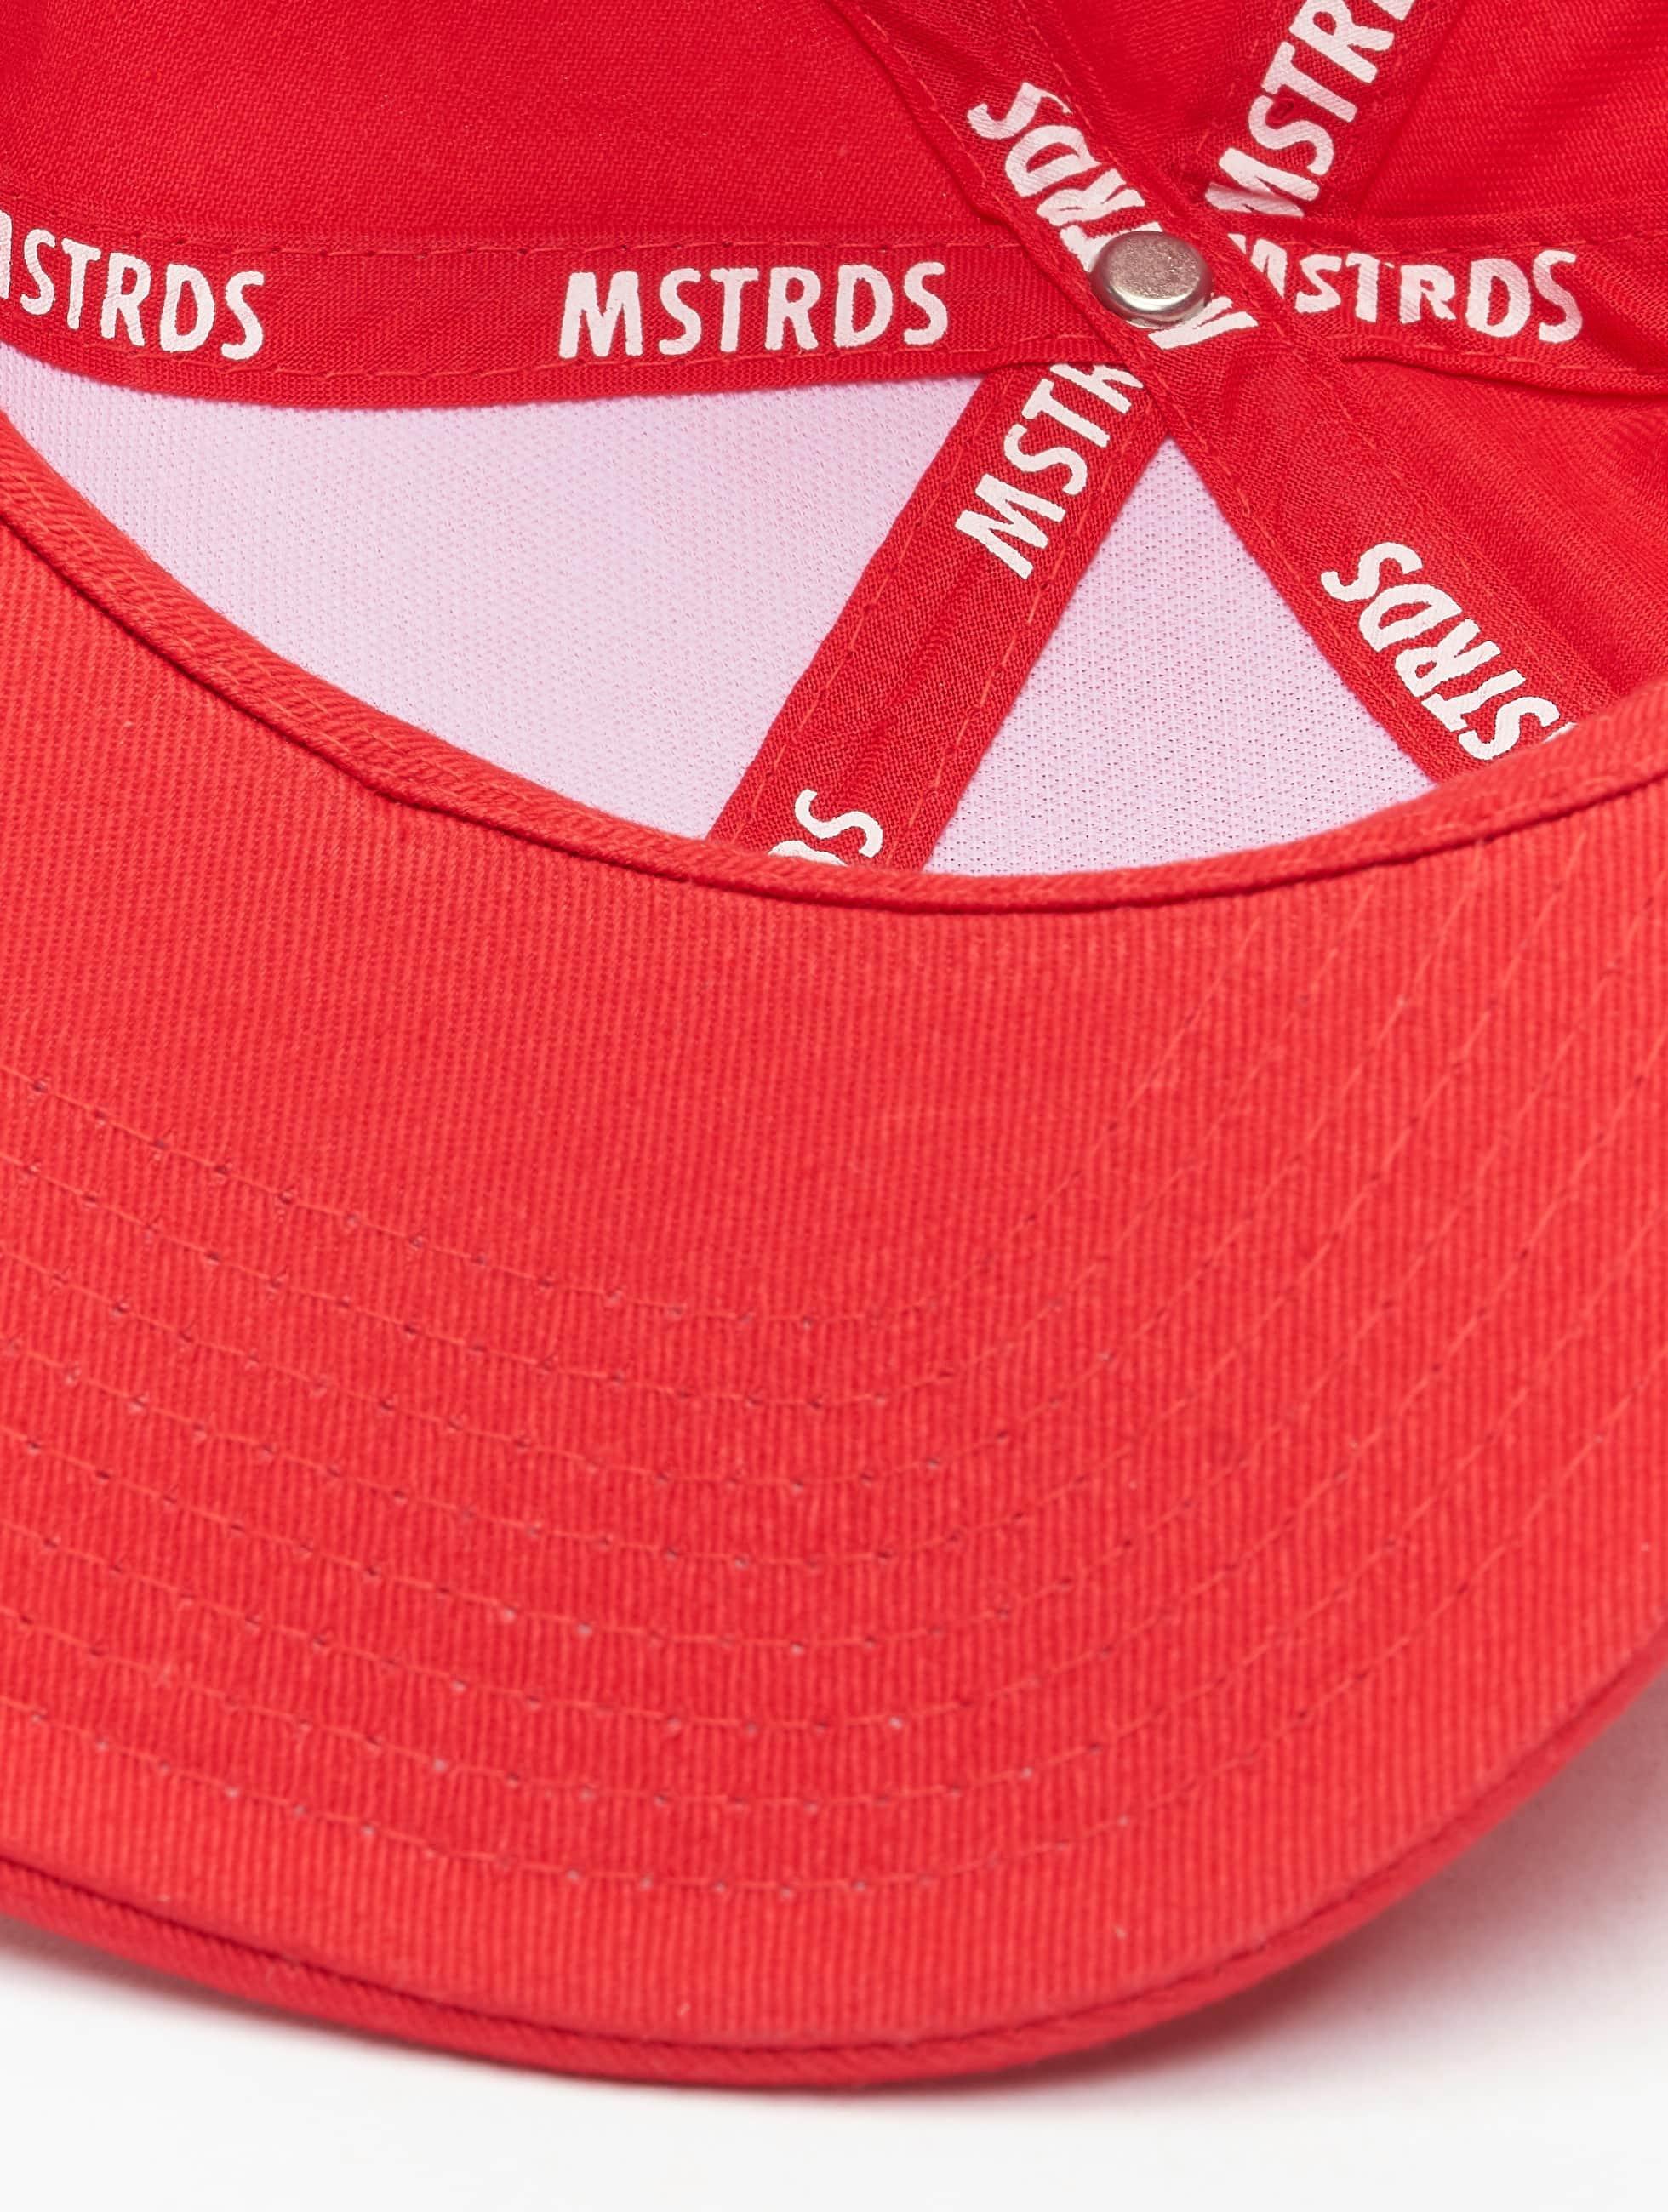 MSTRDS Casquette Snapback & Strapback Money Clip rouge